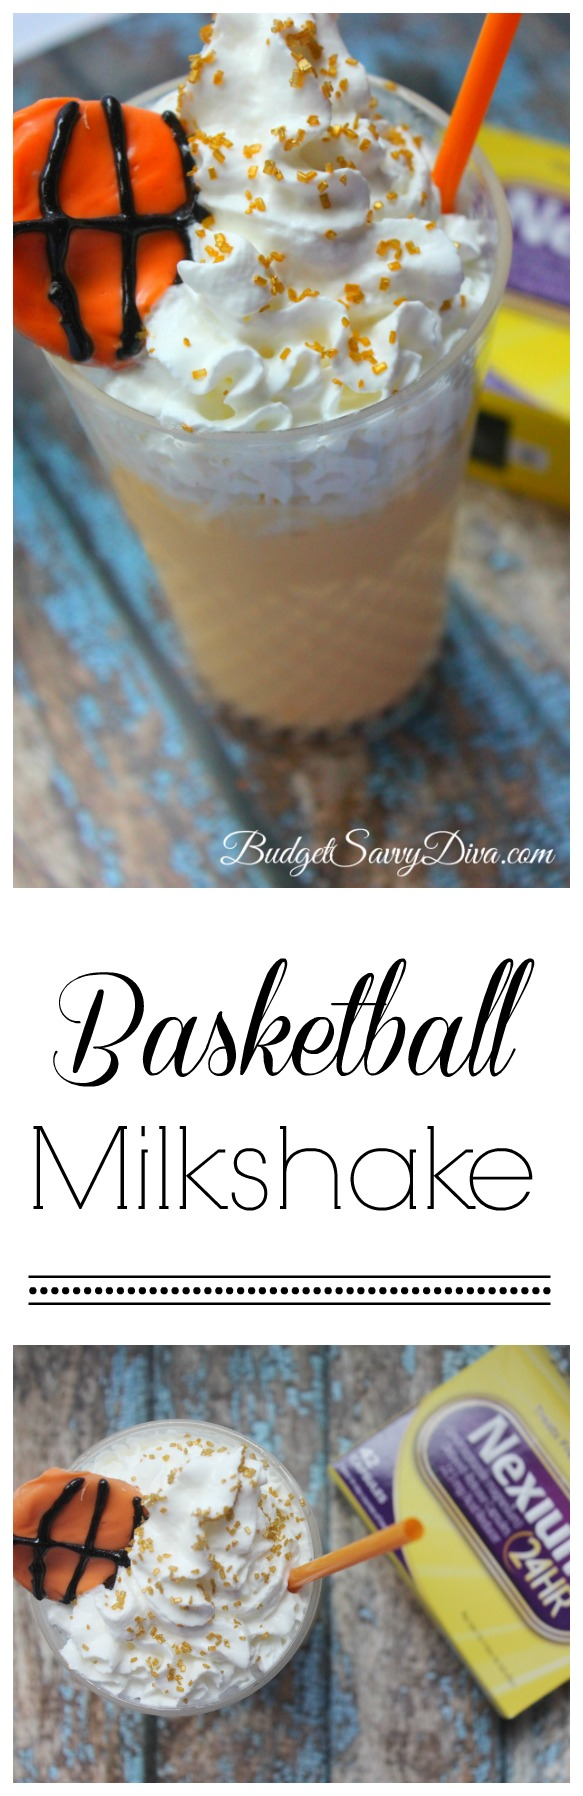 Basketball Milkshake Recipe